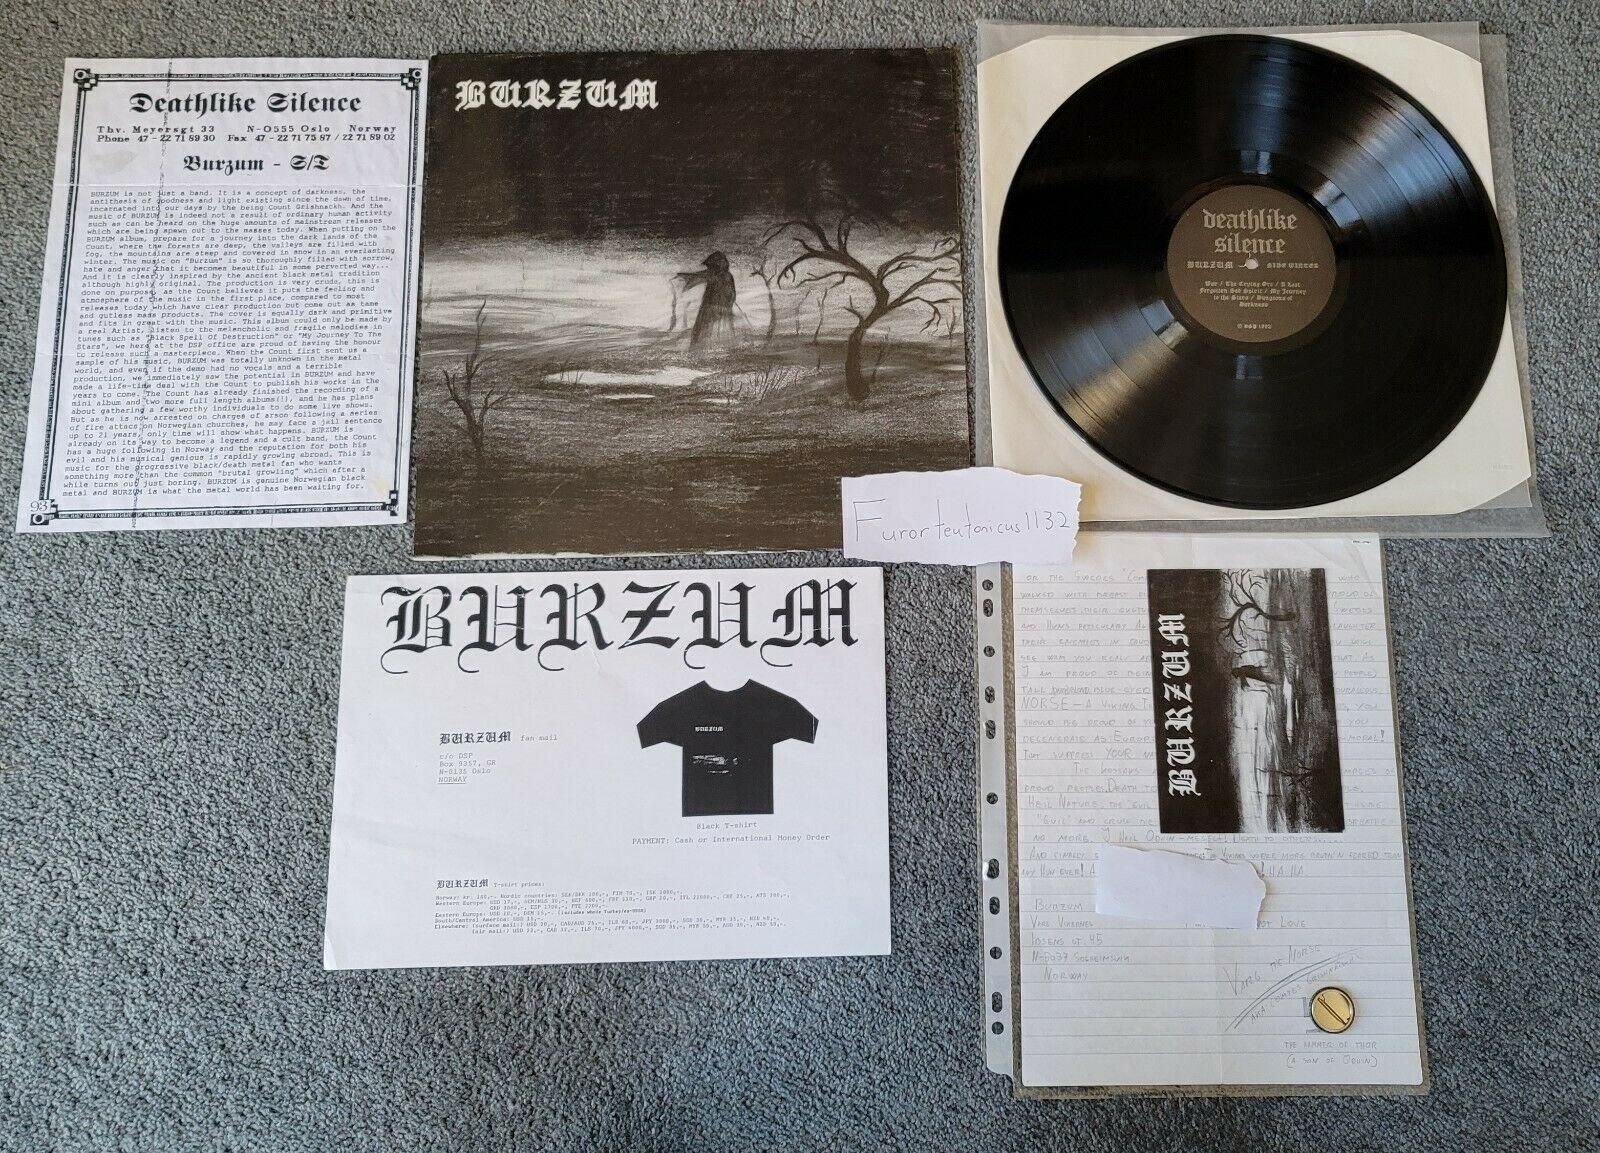 1Burzum self titled first press vinyl LP Varg Vikernes letter Darkthrone Mayhem